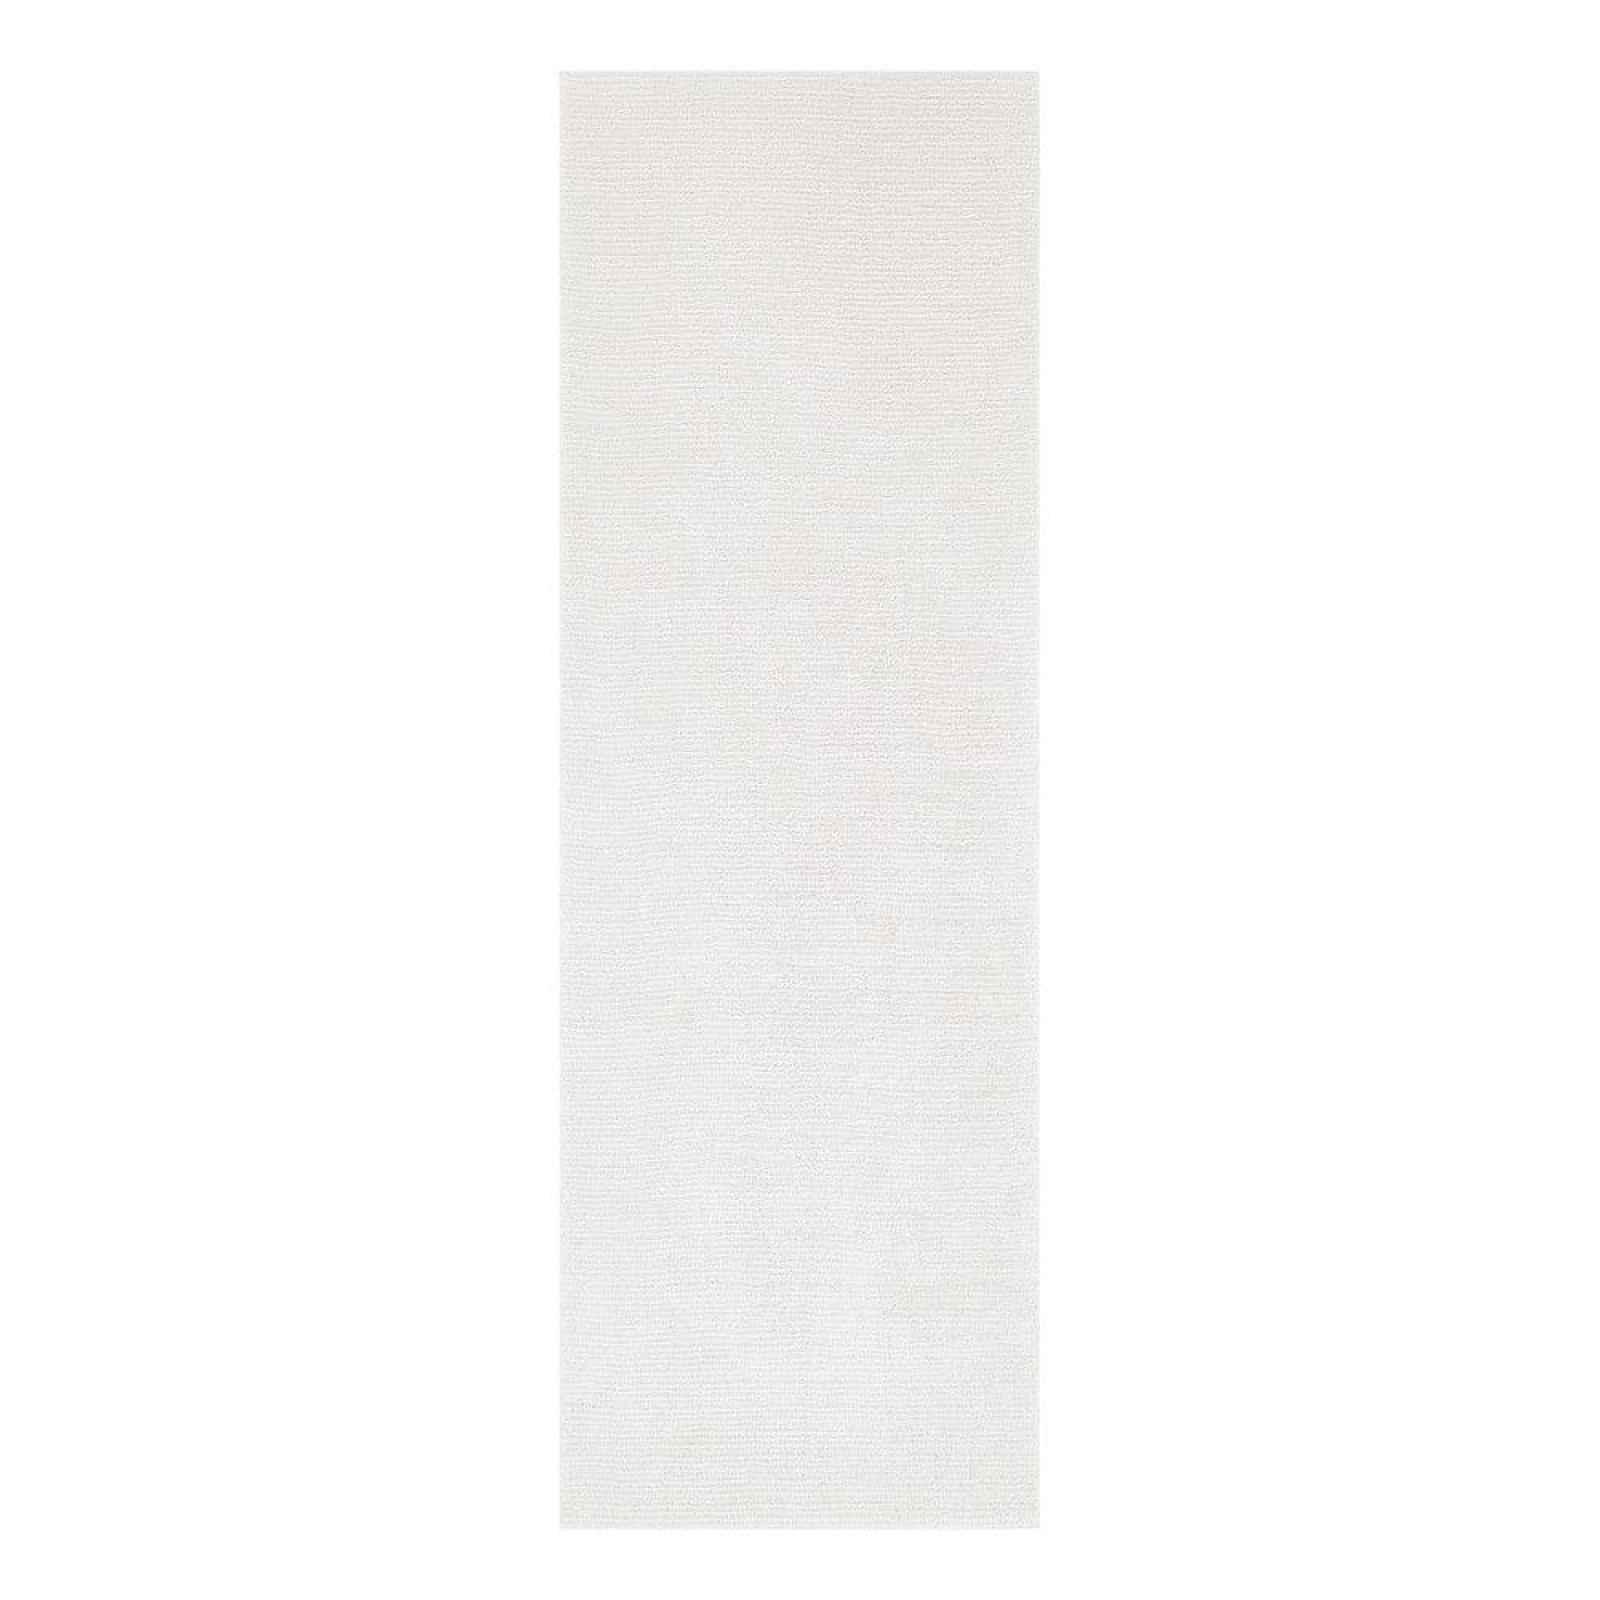 Krémový běhoun Mint Rugs Supersoft, 80 x 250 cm